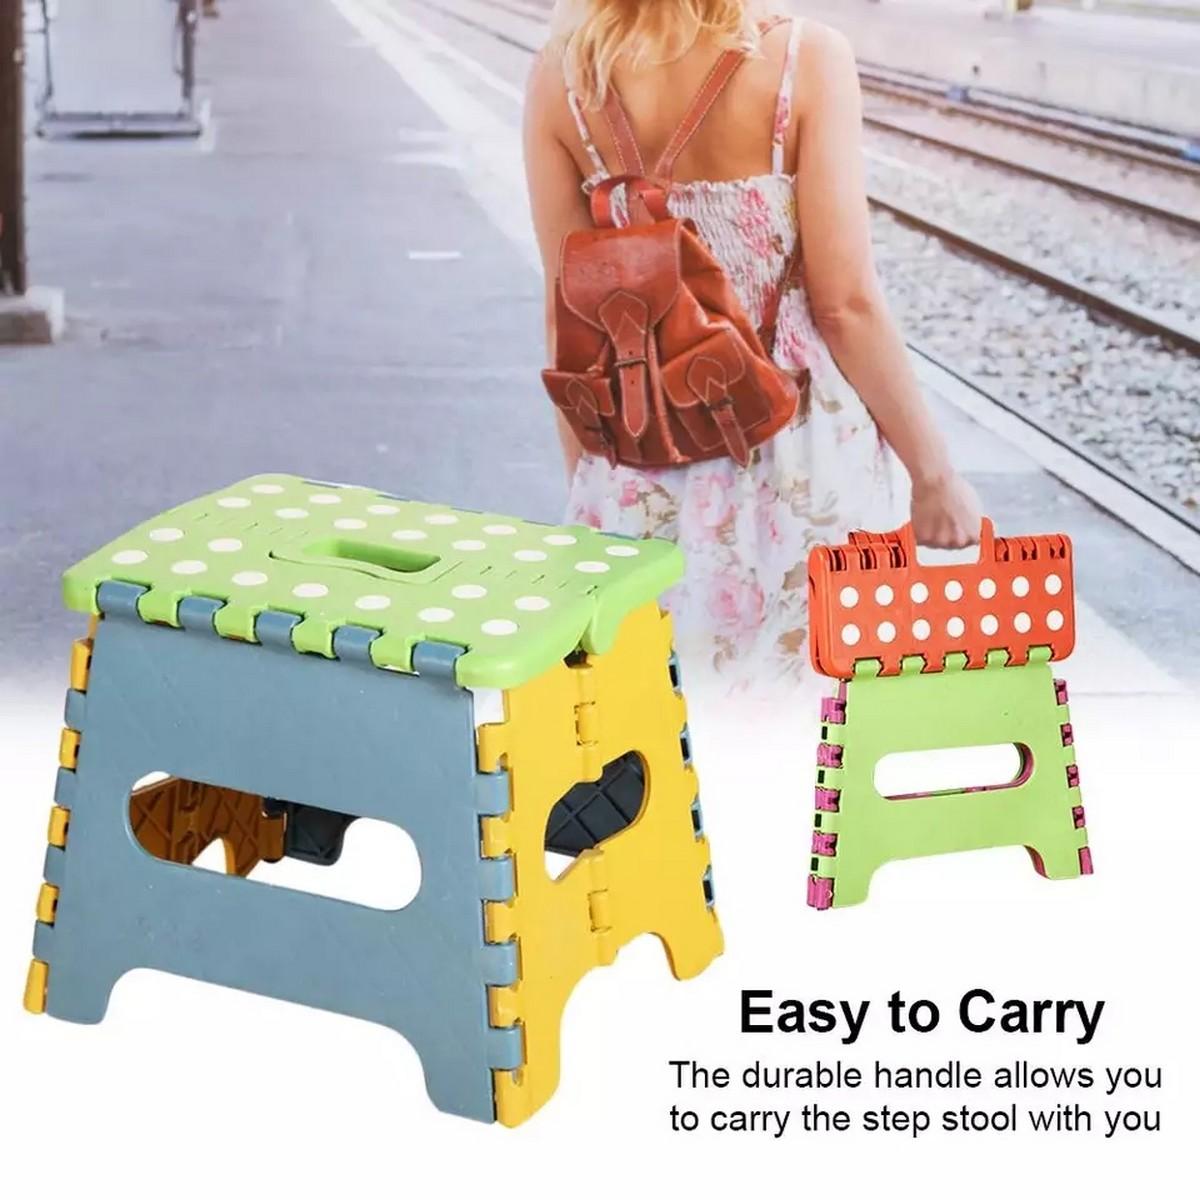 Lightweight Folding Step Stool Plastic Durable Easy Foldable Plastic Chair (Random Colour) -Small Size(19cm x 19cm x 25cm )